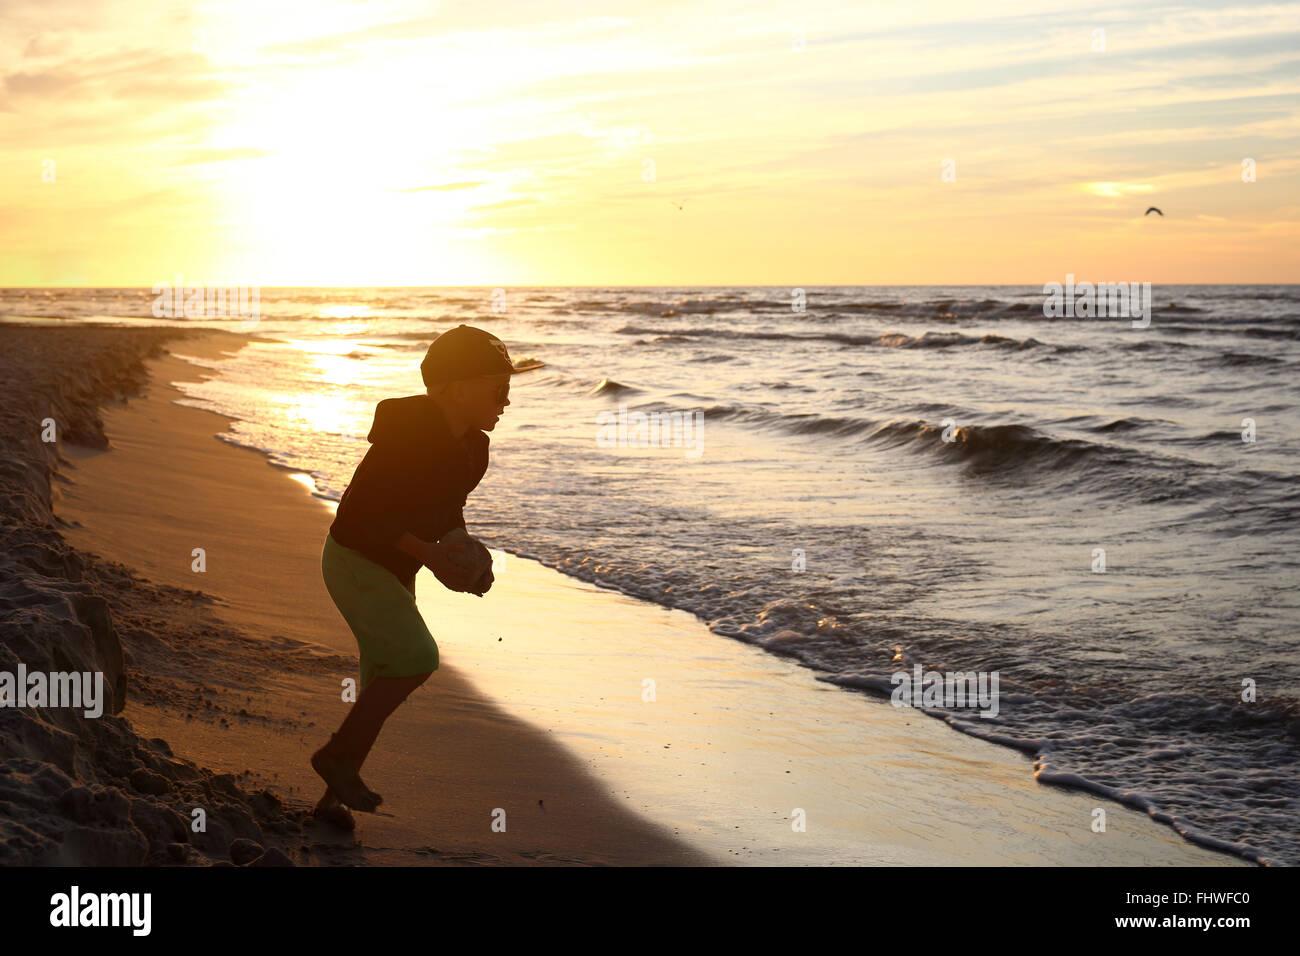 Sonnenuntergang über dem Meer. Spaß bei Sonnenuntergang. Glücklicher Tag. Walking am Strand, Sonnenuntergang Stockbild